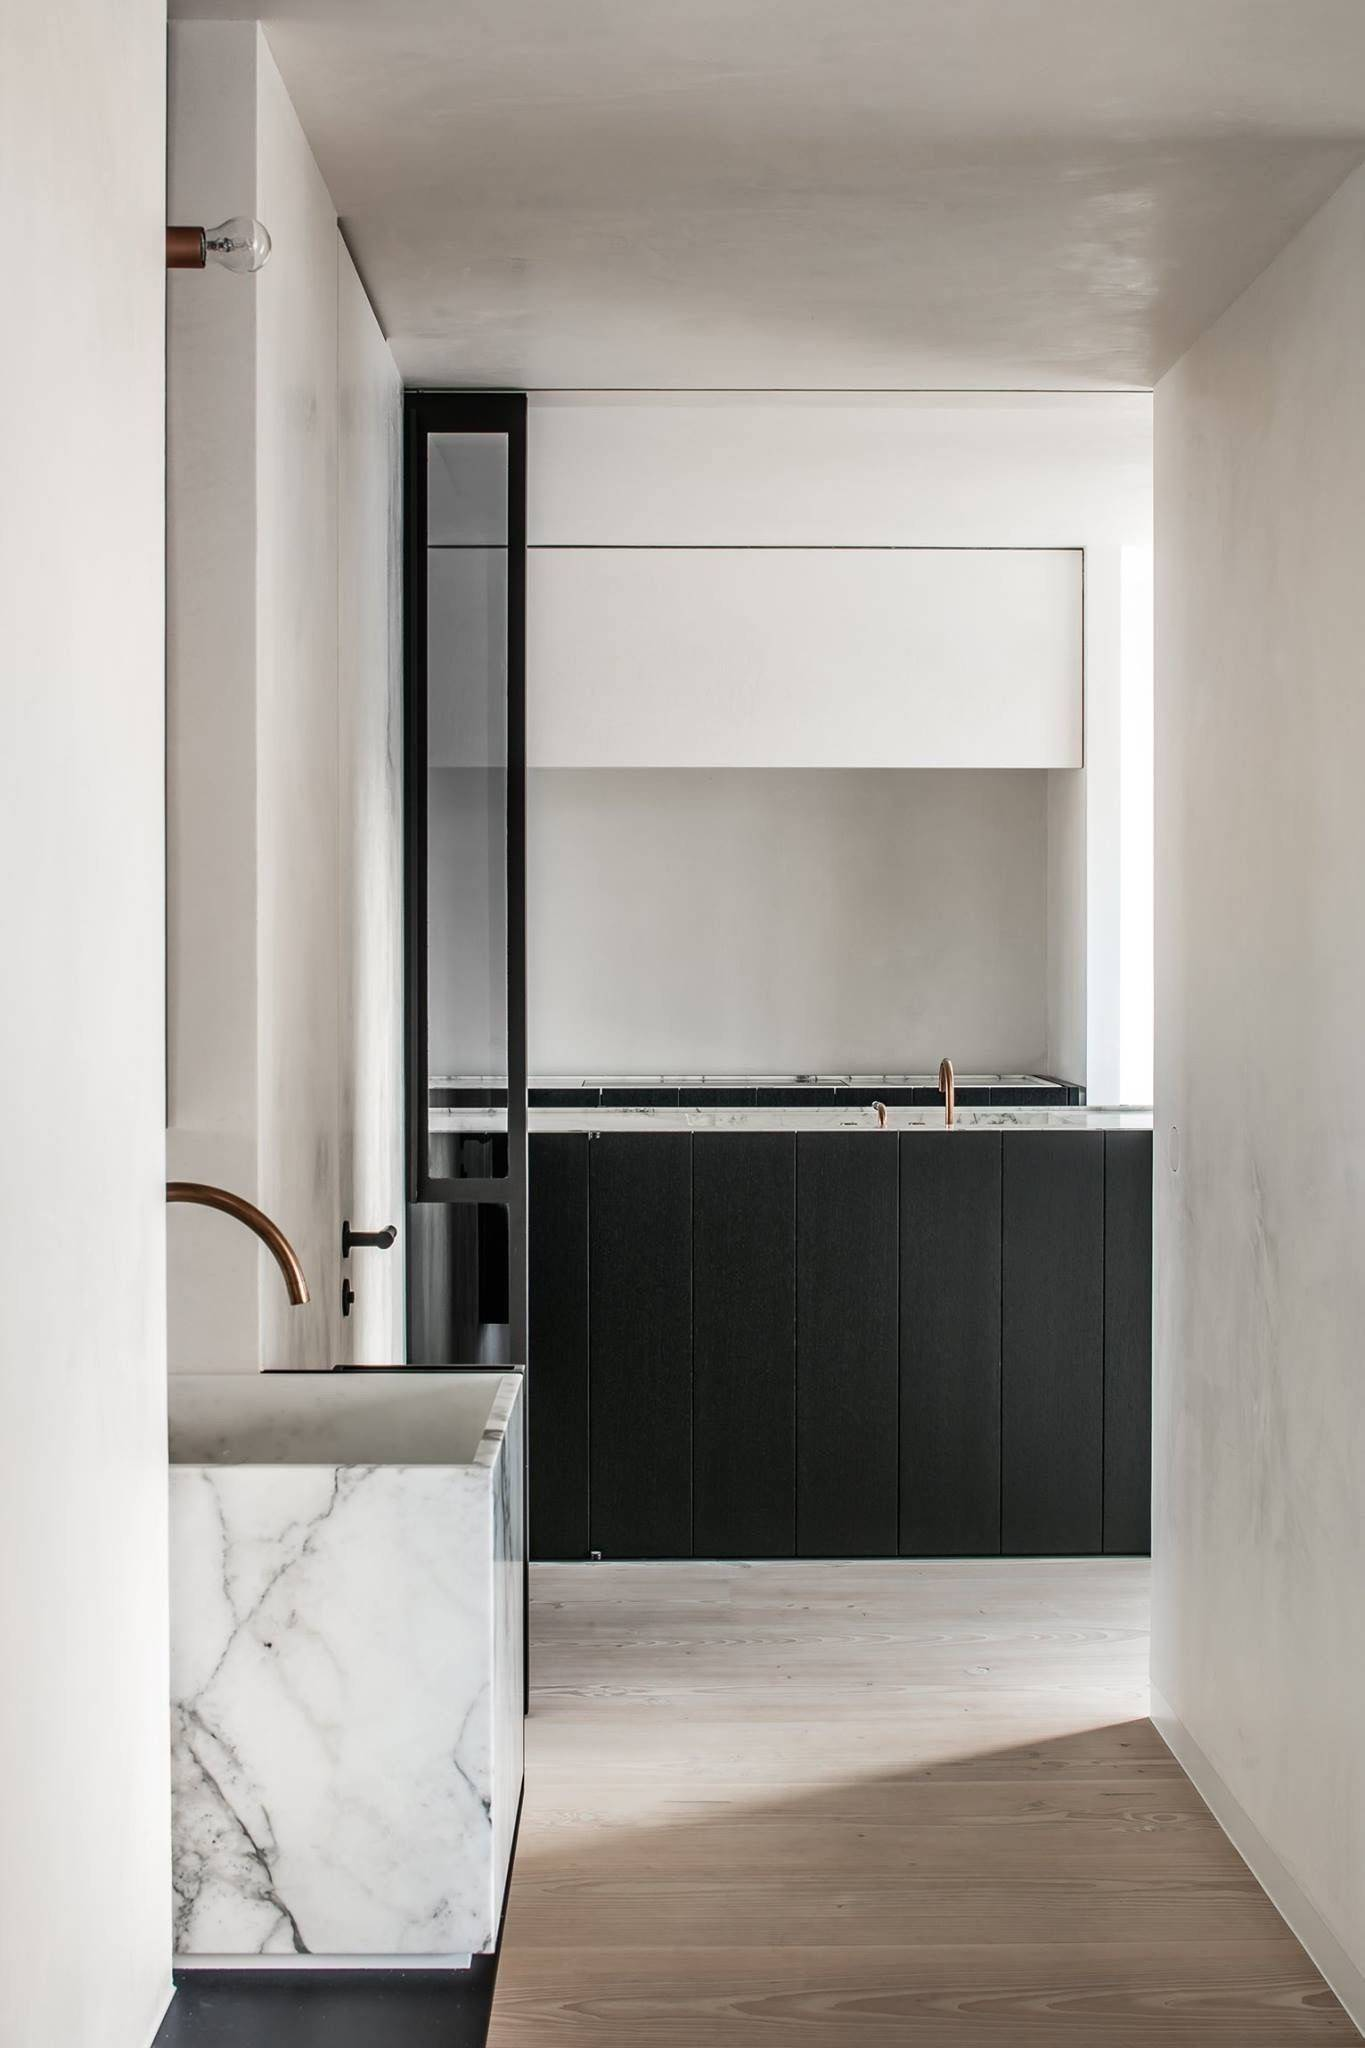 minimalist interior design awesome s media cache ak0 pinimg originals 0d 13 65 of minimalist interior design awesome after japanese minimalist design